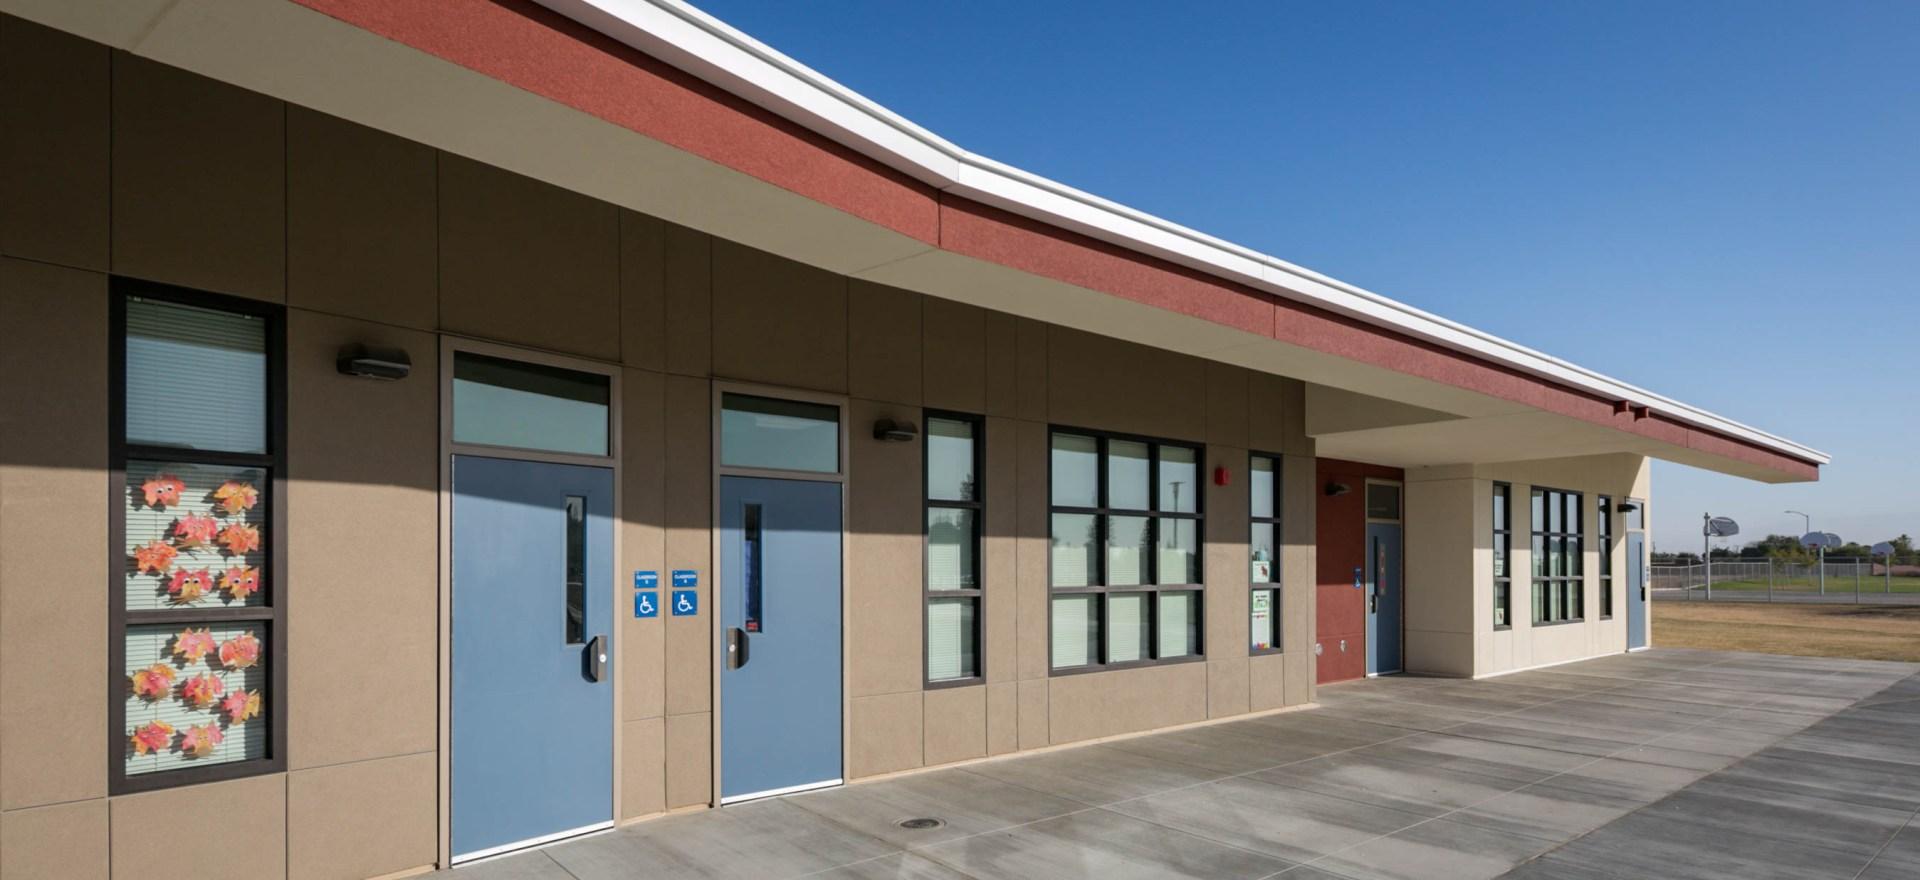 JTSModular-WhitleyElementarySchool-RobRijnenPhotography (11 of 36)